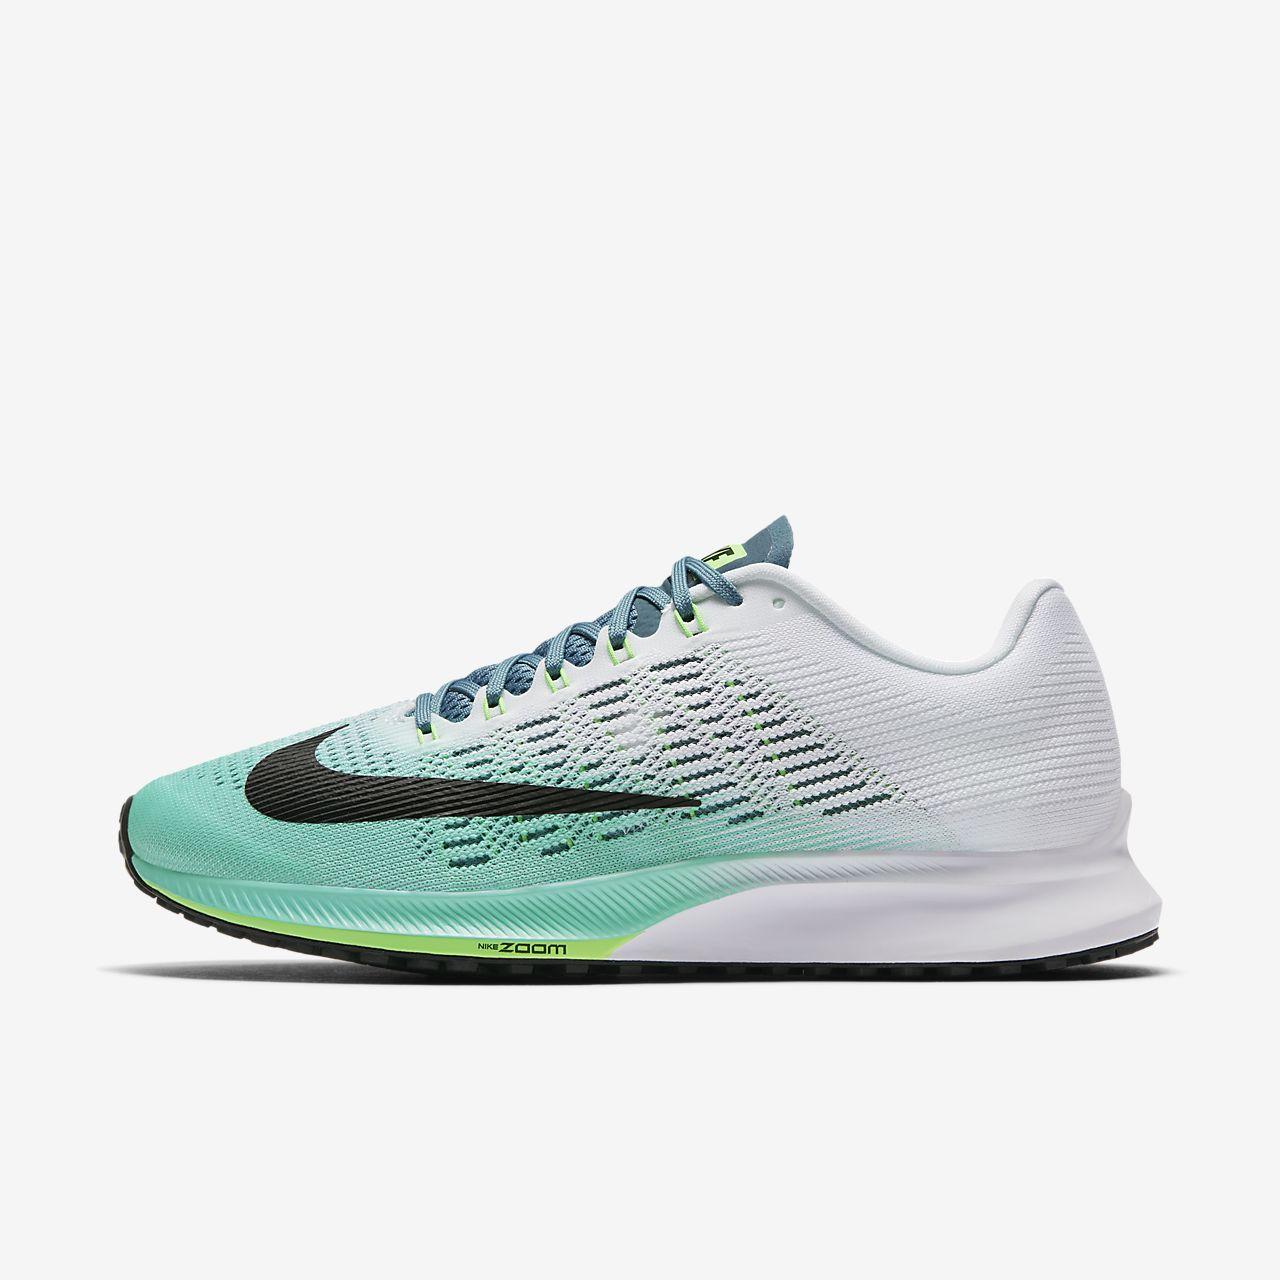 ... Nike Air Zoom Elite 9 Damen-Laufschuh